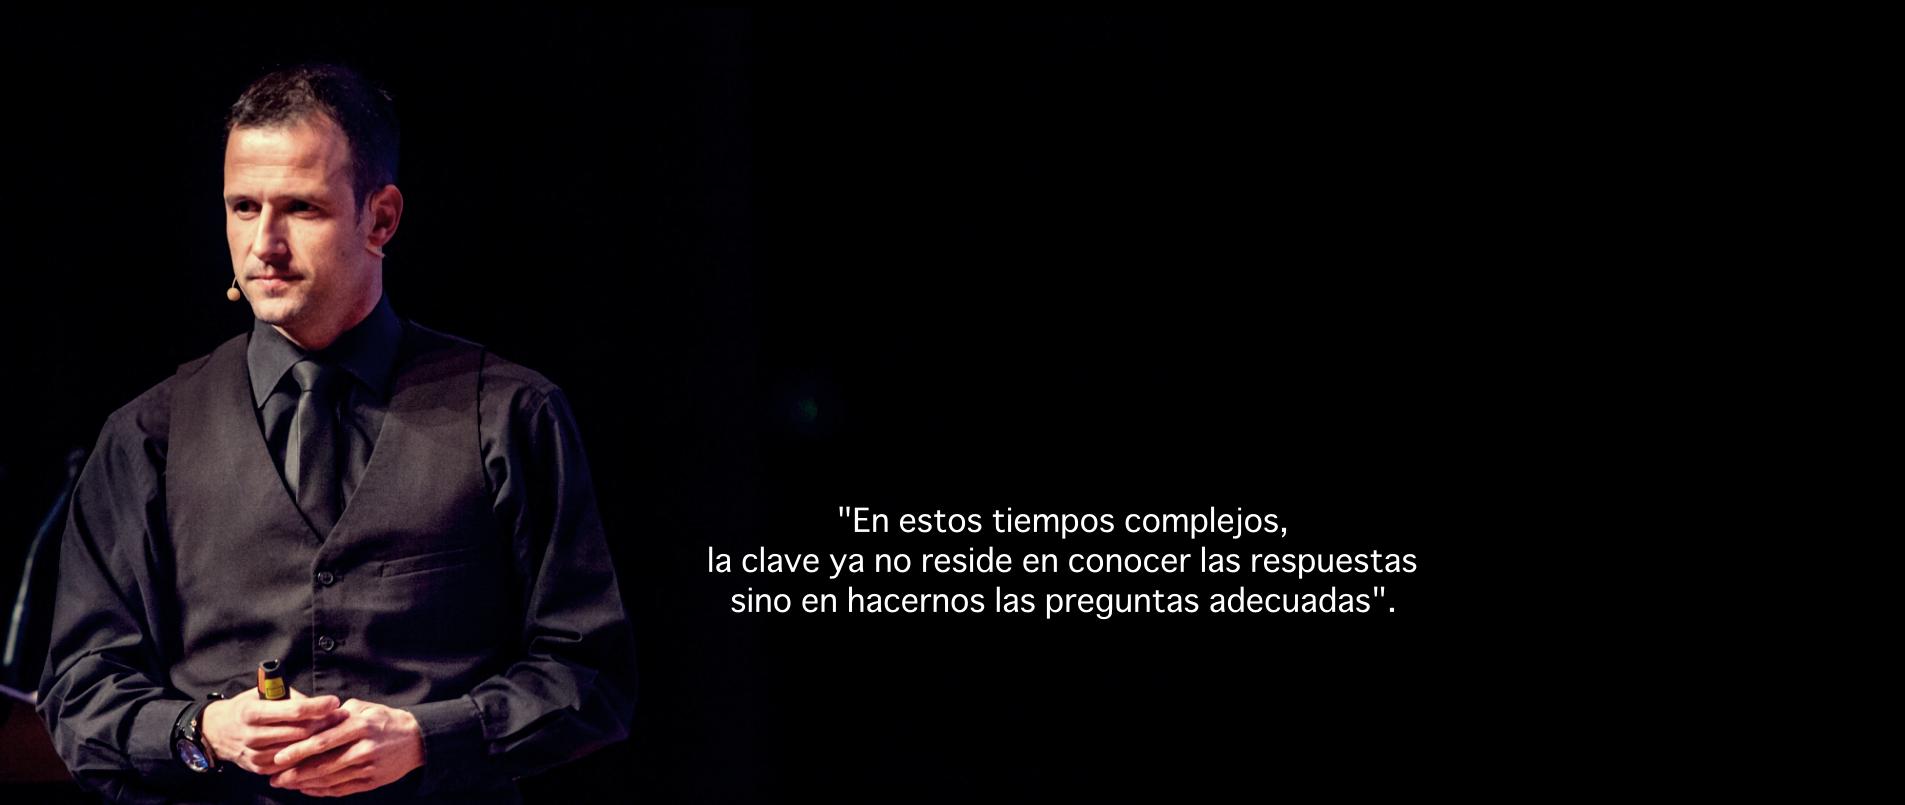 SergioBernues7